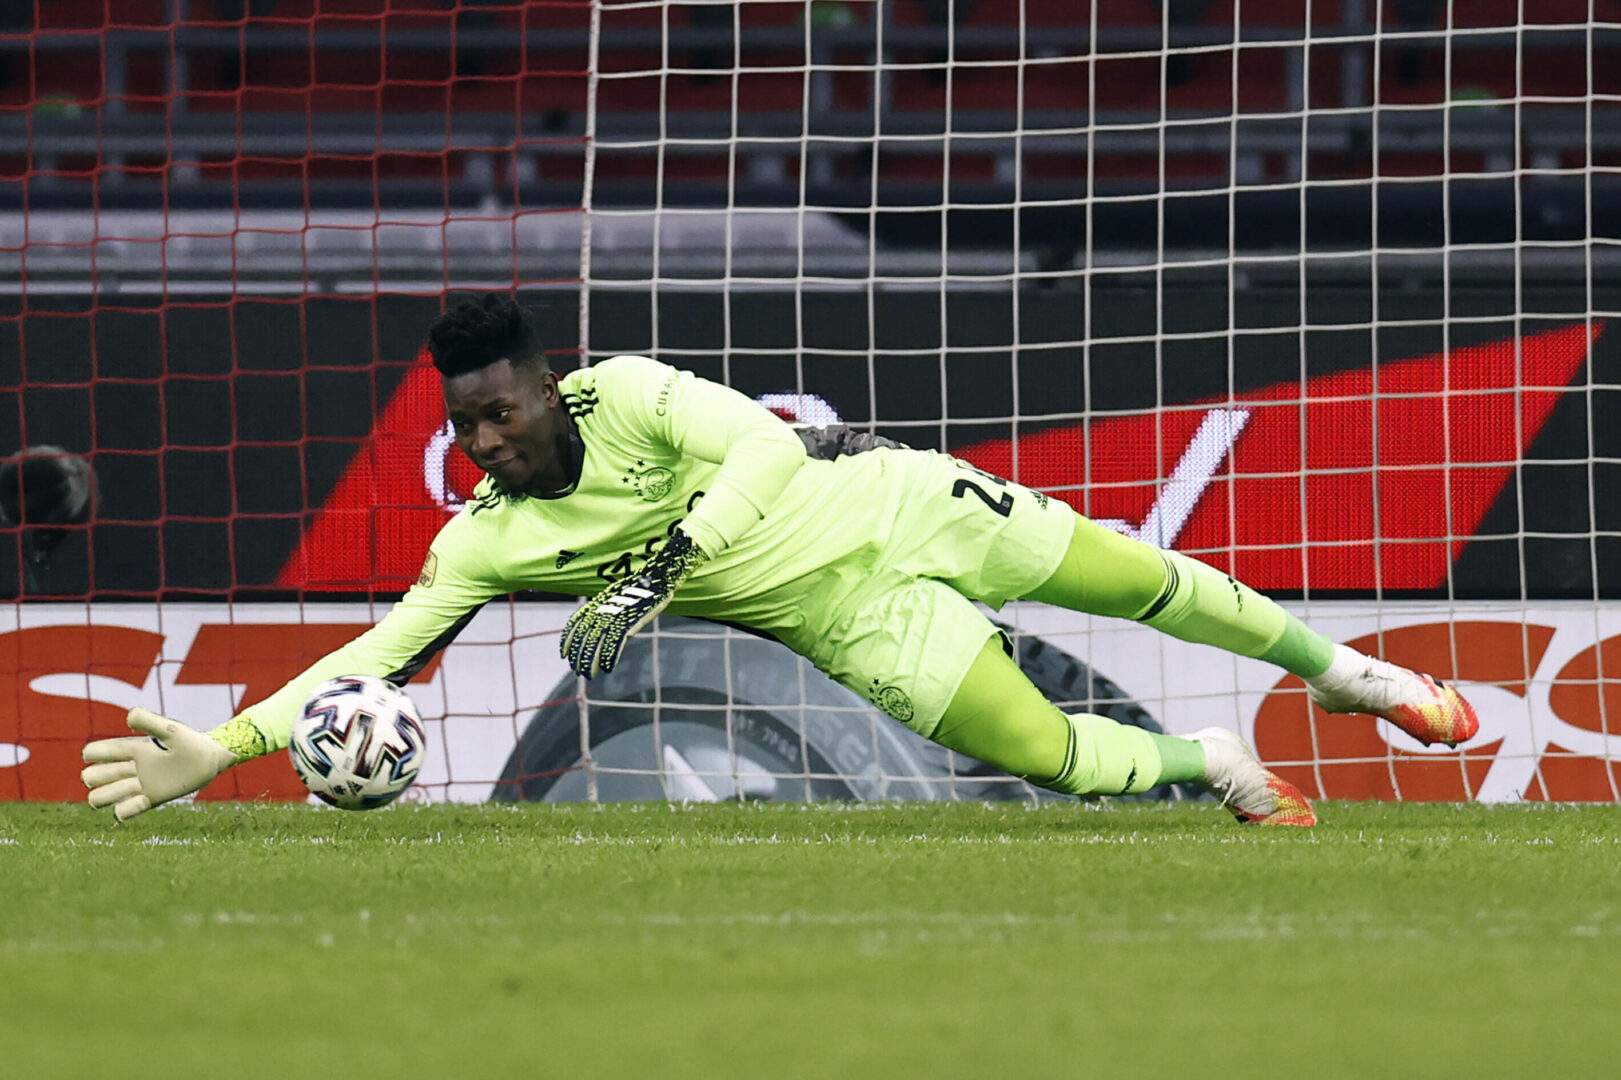 Wechsel rückt näher: Olympique Lyon mit Andre Onana einig